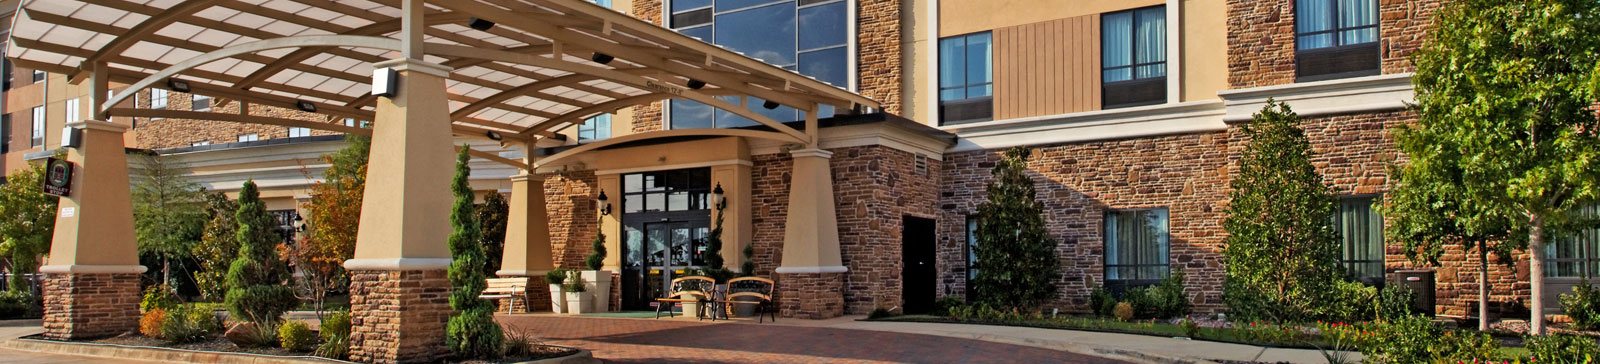 Exterior View of Holiday Inn Arlington NE - Rangers Ballpark